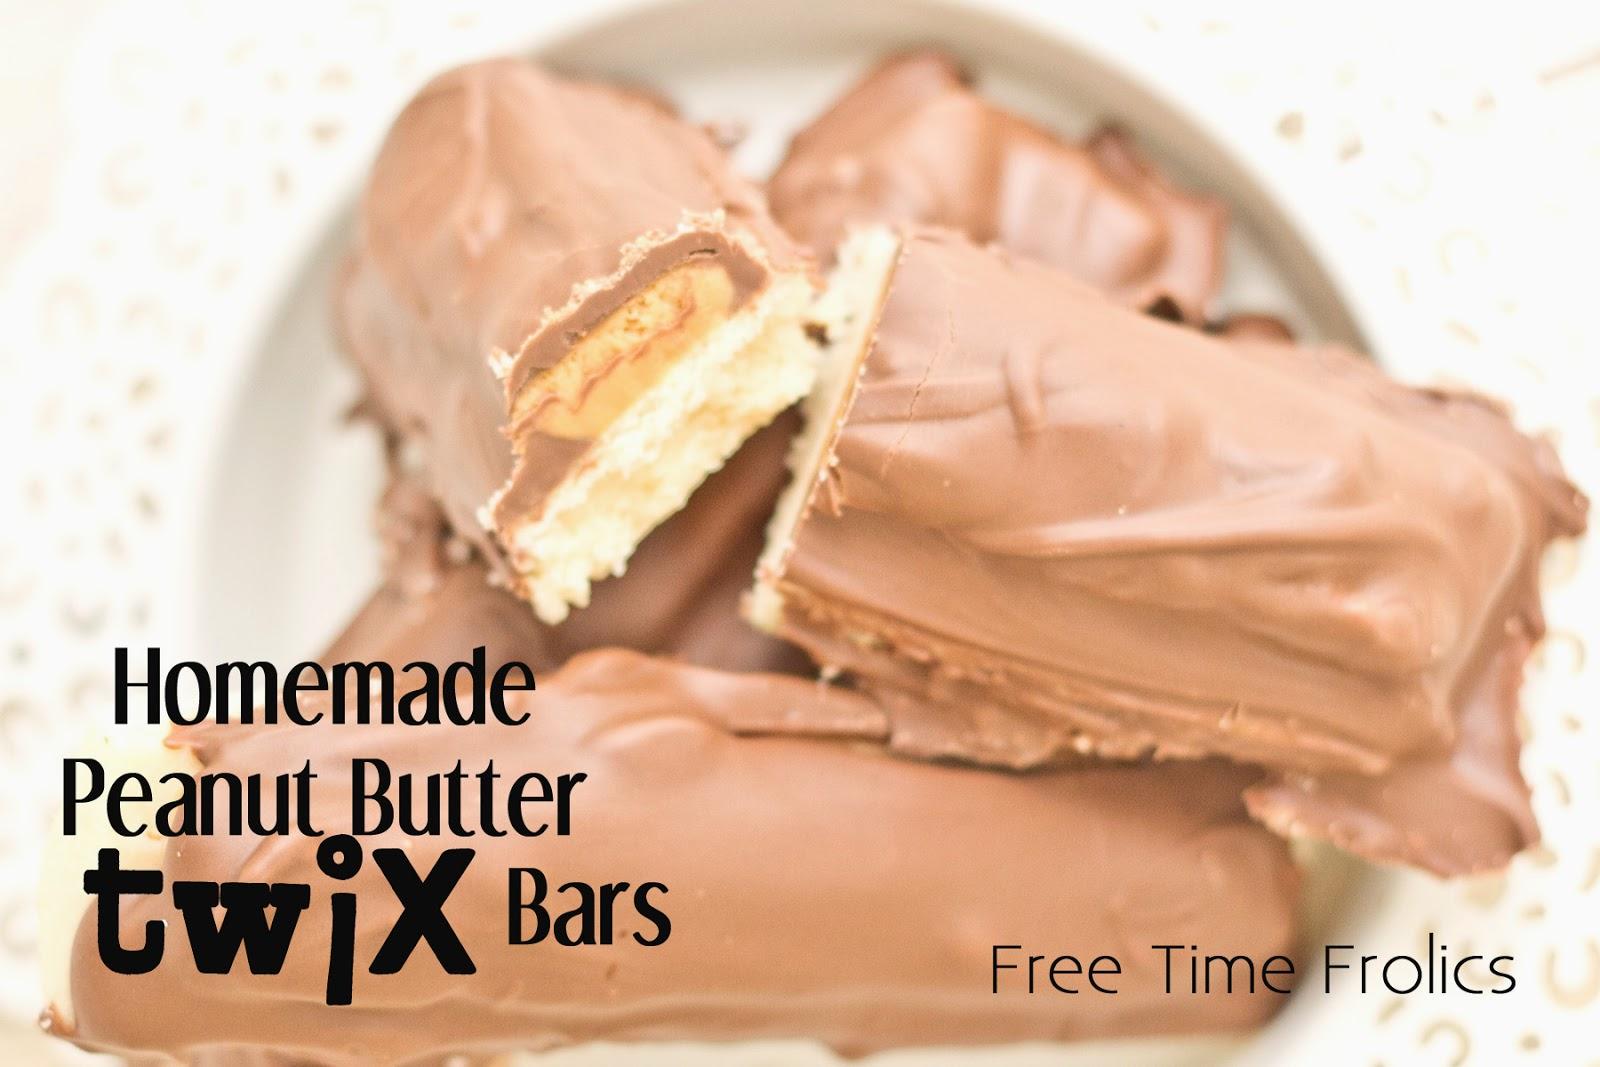 Homemade Peanut Butter Twix www.freetimefrolics.com #recipe